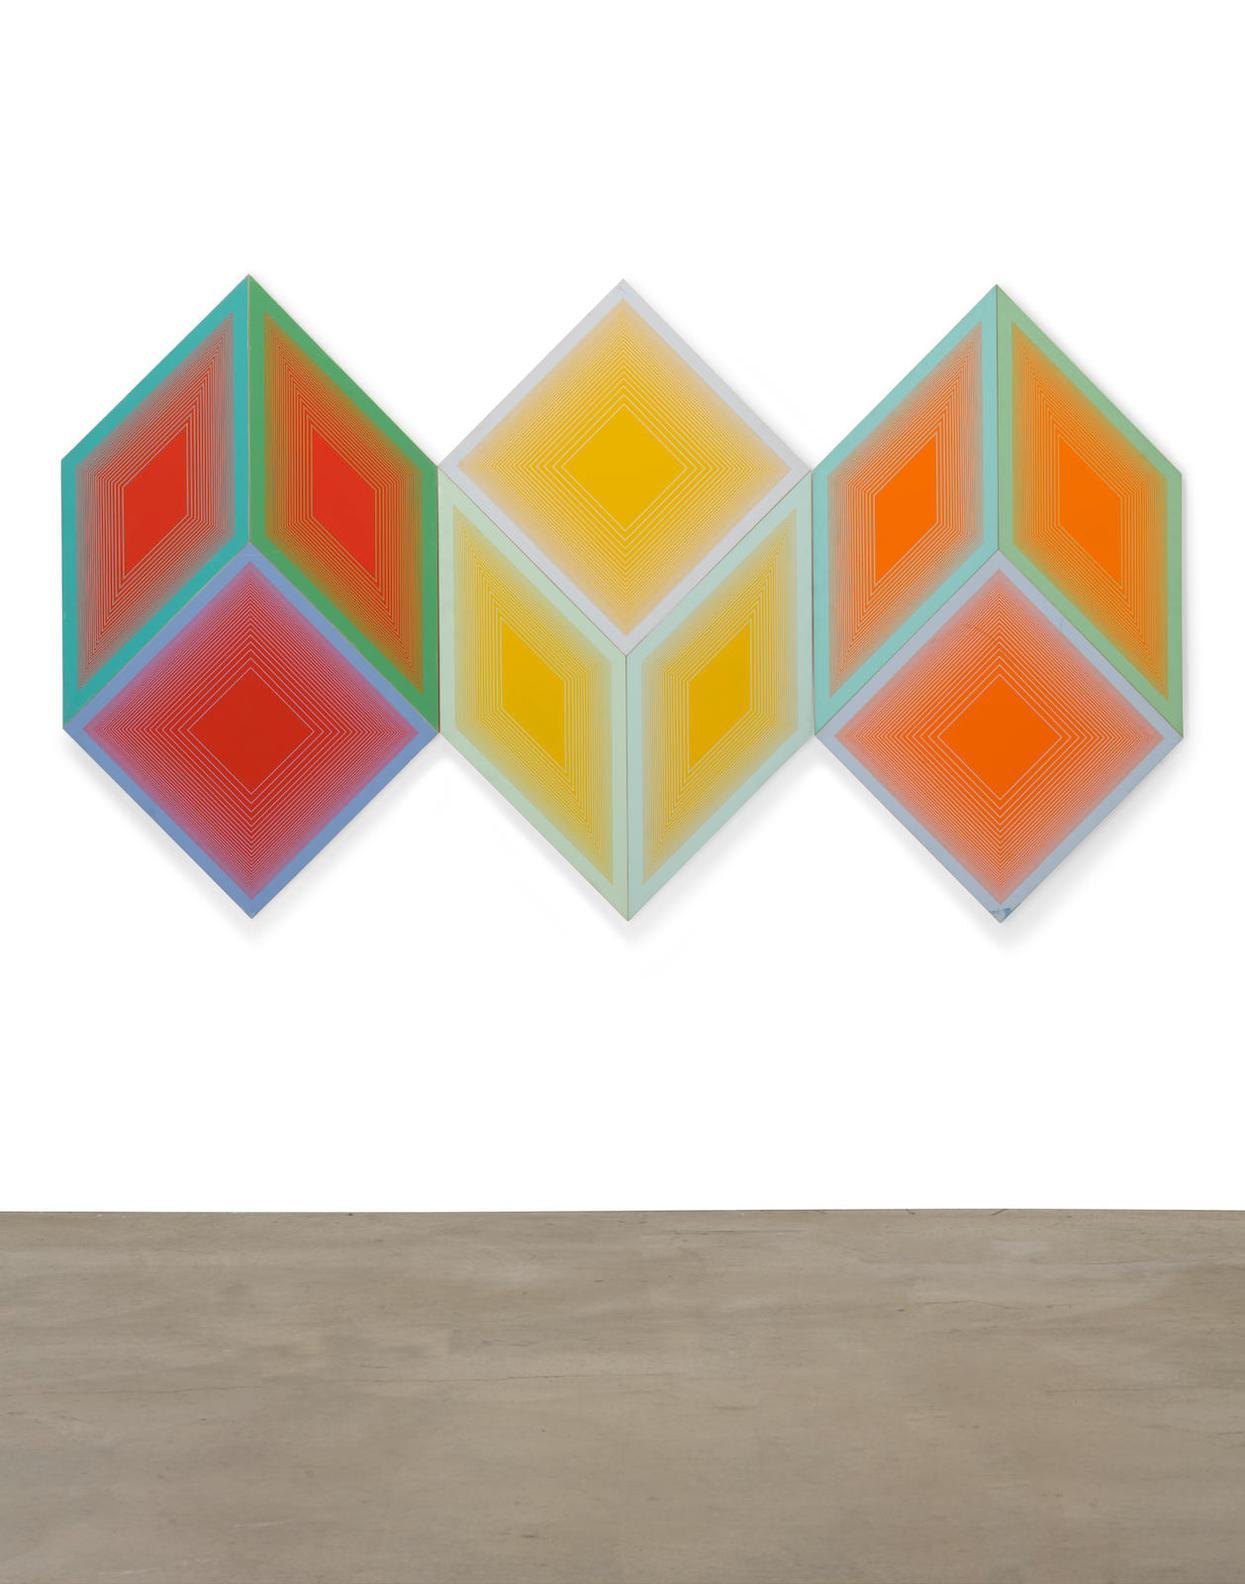 Richard Anuszkiewicz-Volumes: A Variable Multiple-1970